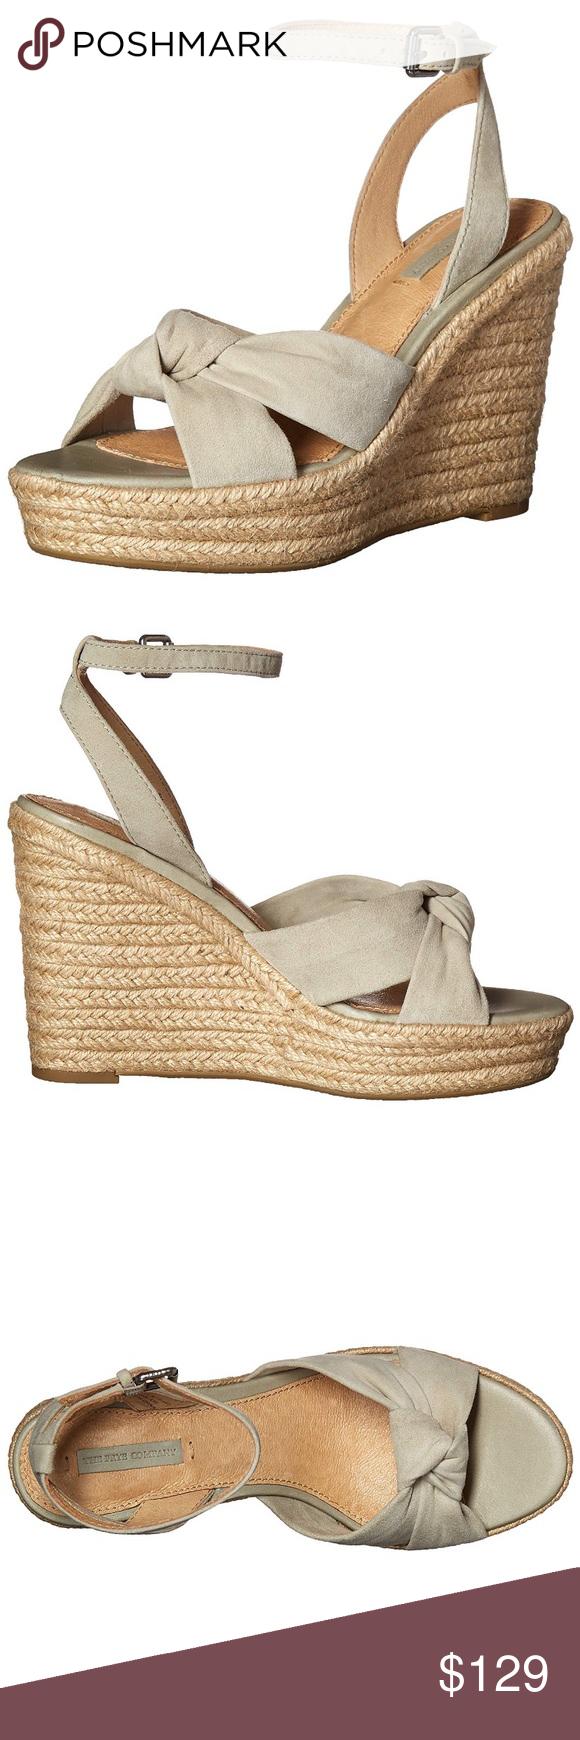 ae0dbfaf48e Frye Charlotte Twist Sage Espadrille Wedge Sandals New In Box- Frye ...